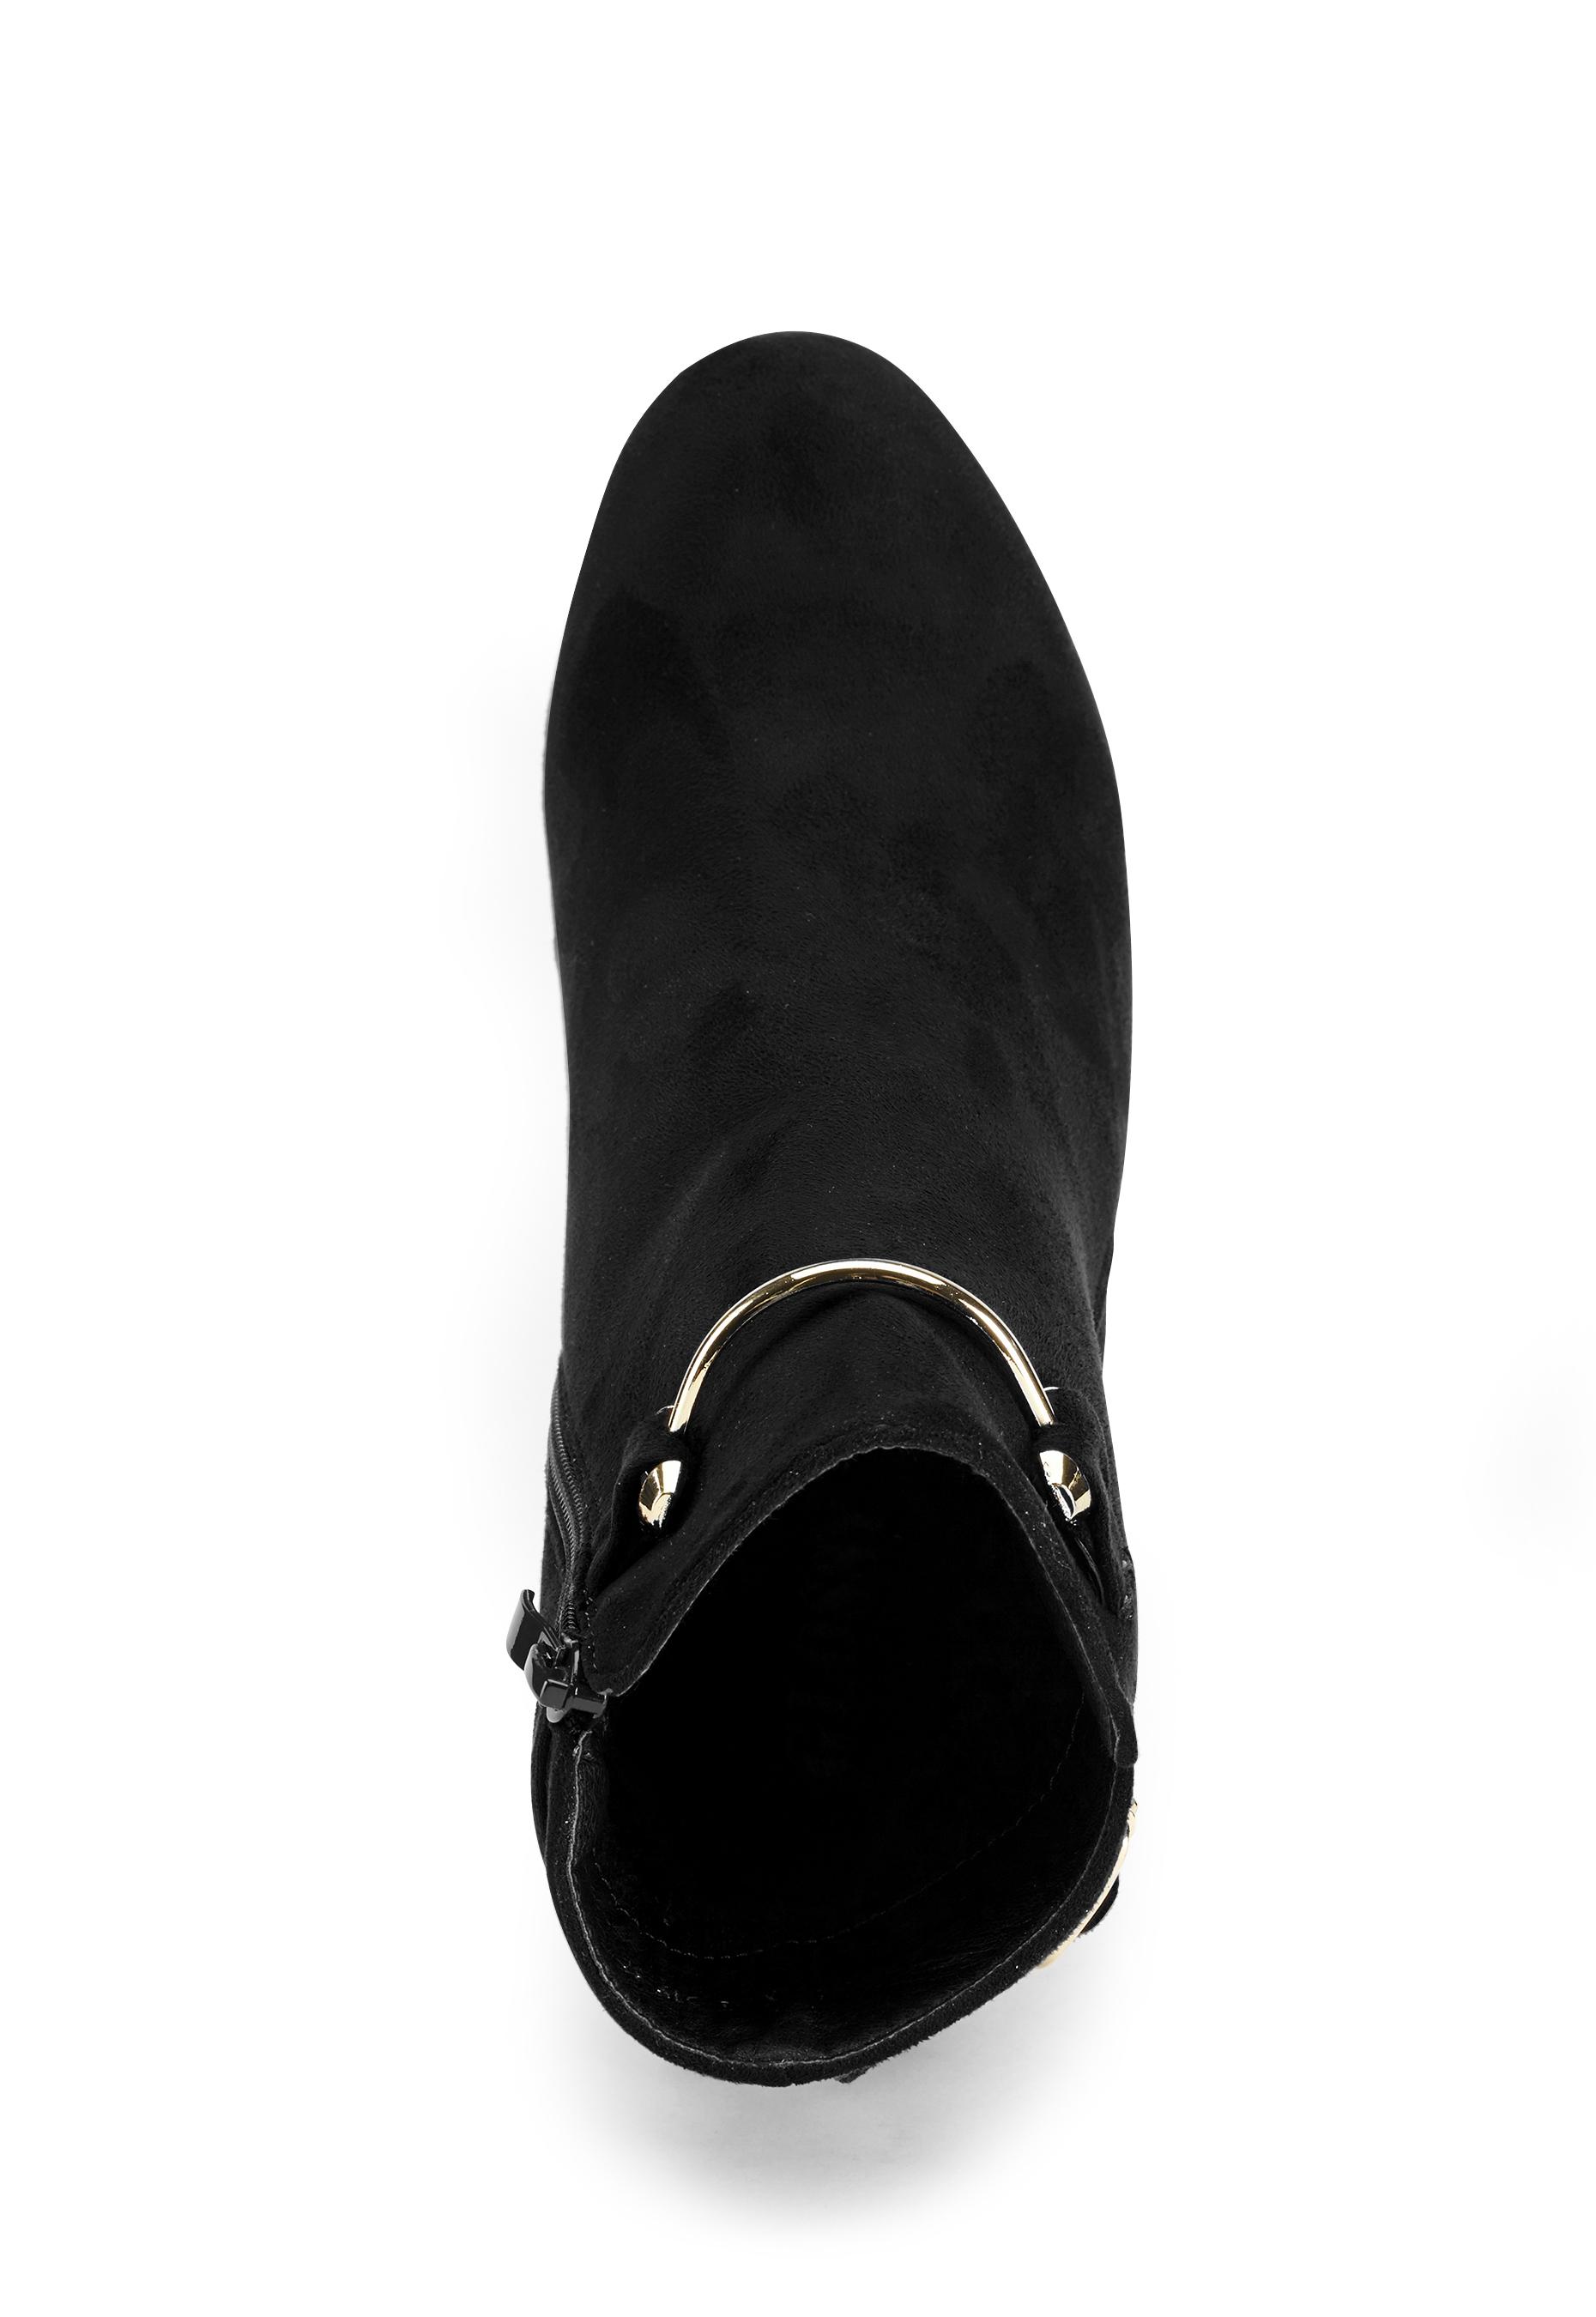 Glossy Halle Boots Black Bubbleroom